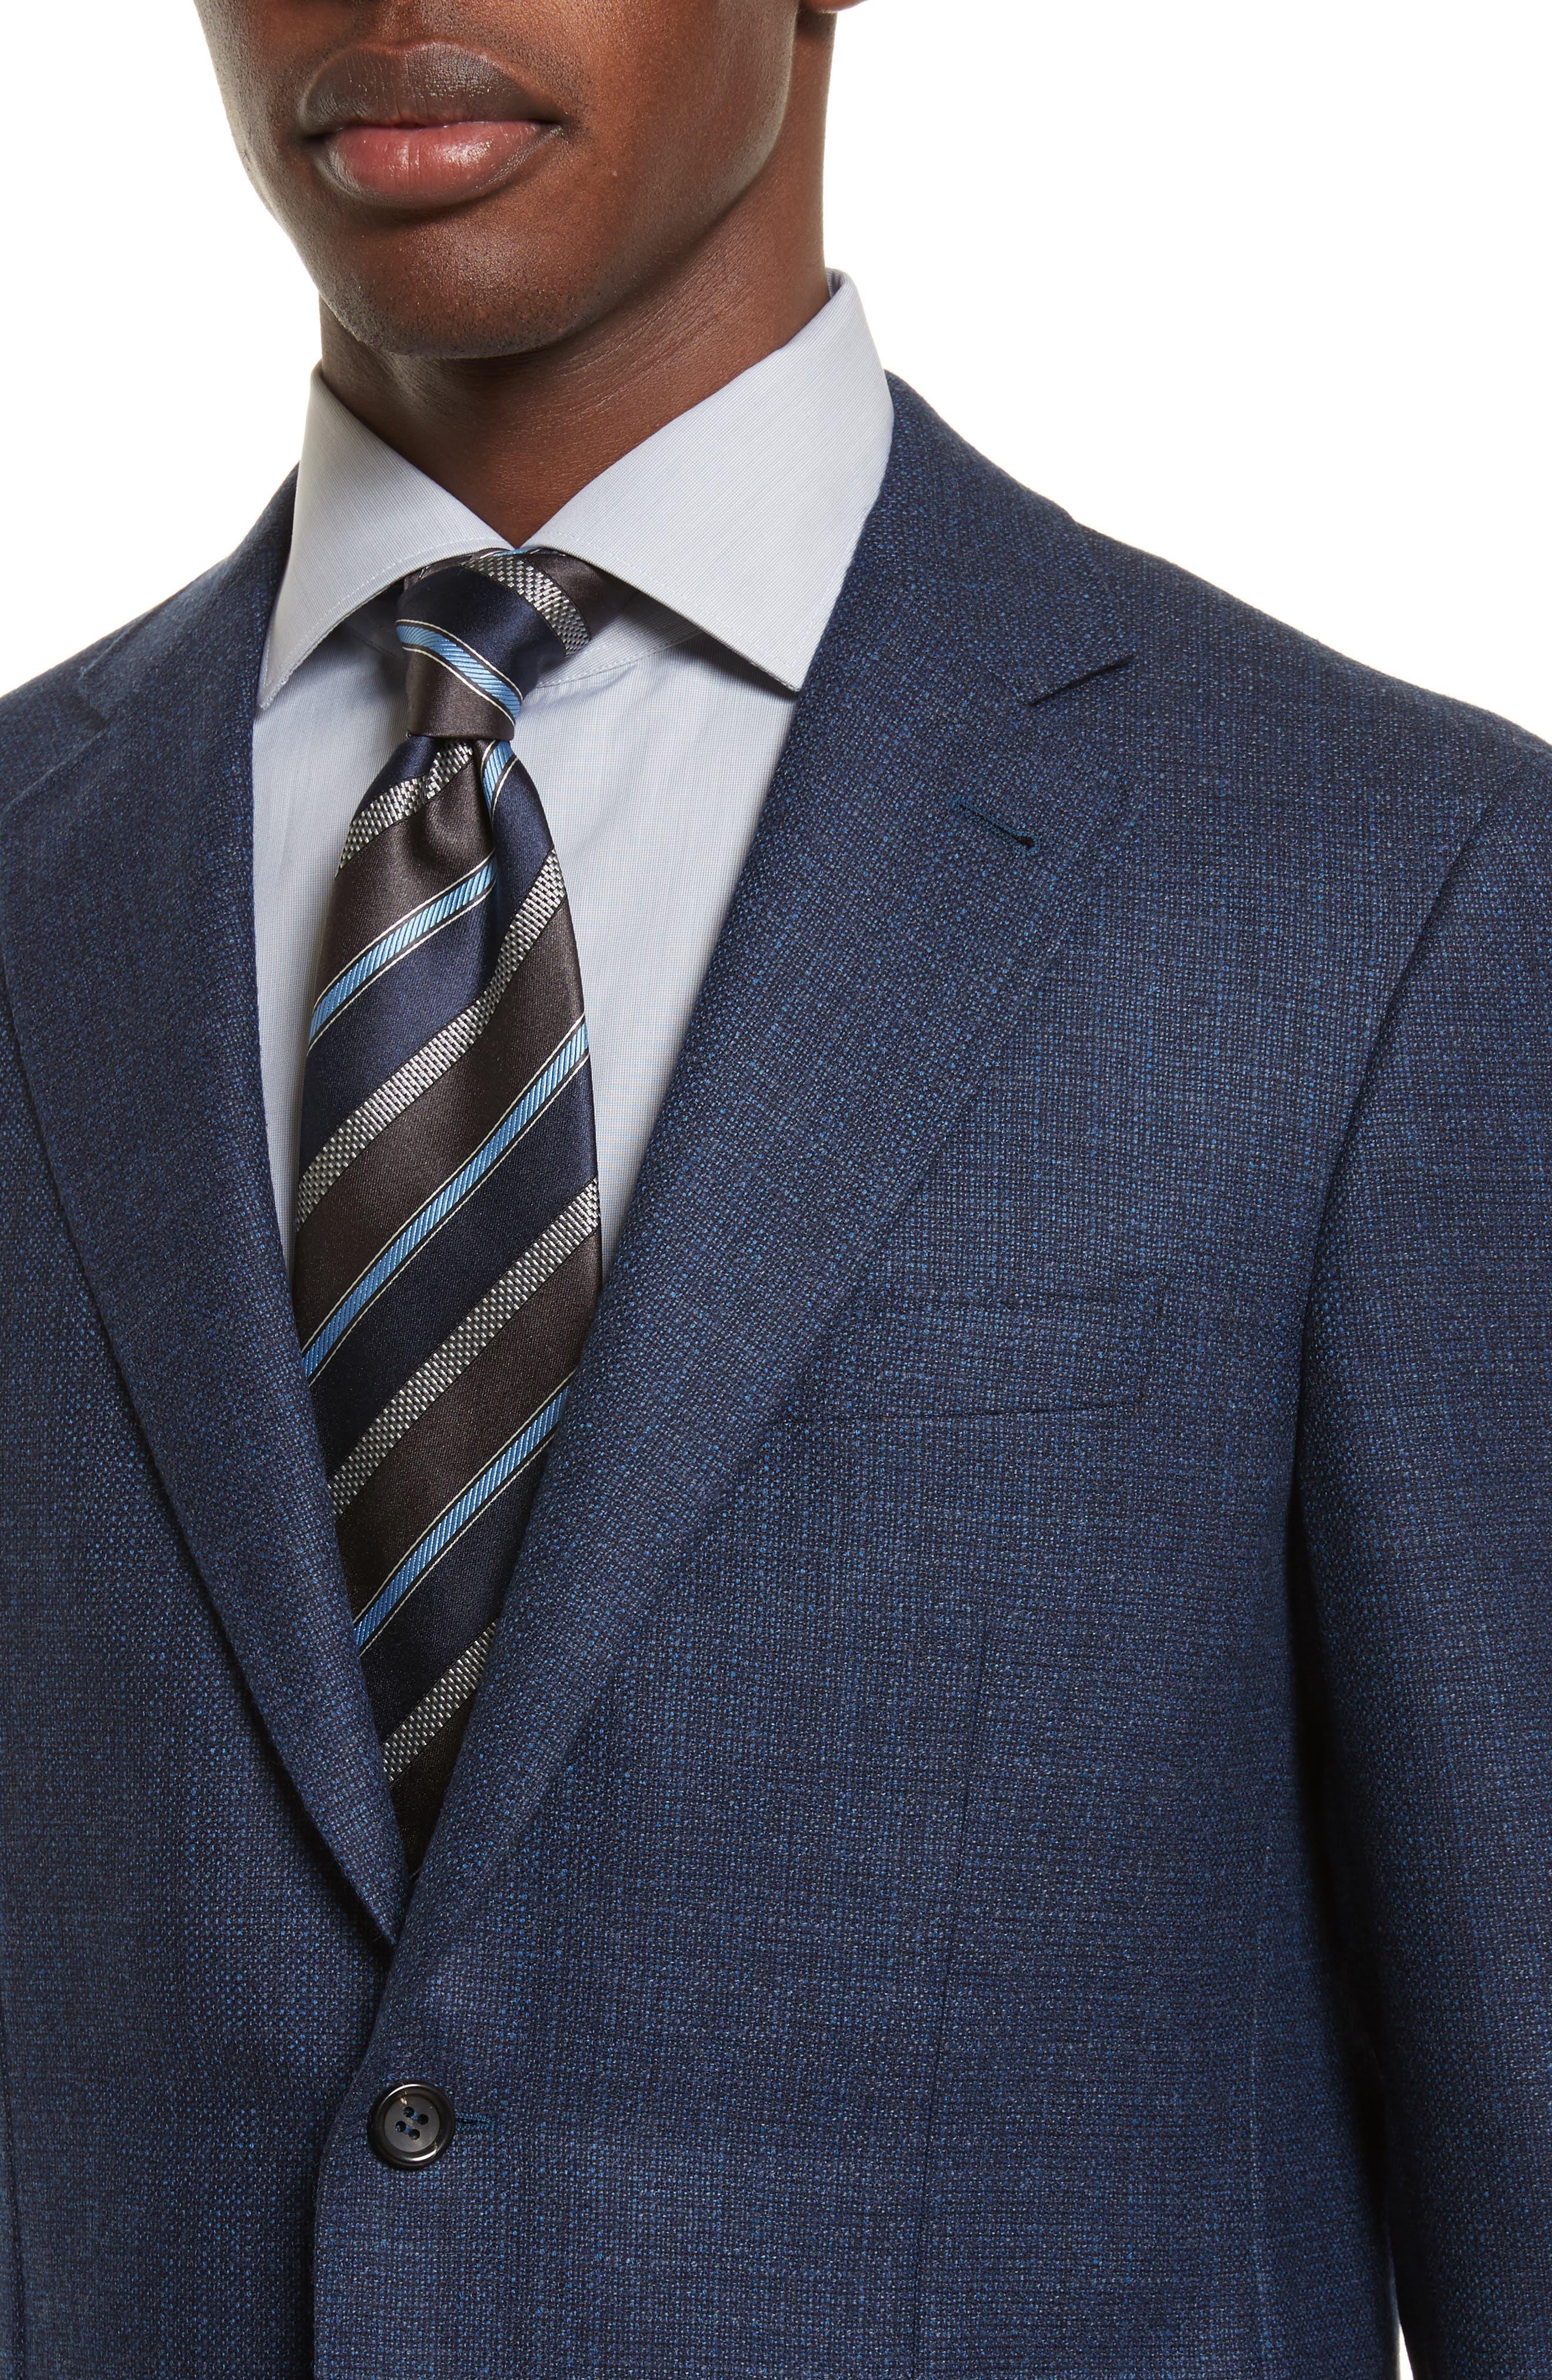 Kei Classic Fit Wool Blazer,                             Alternate thumbnail 4, color,                             400